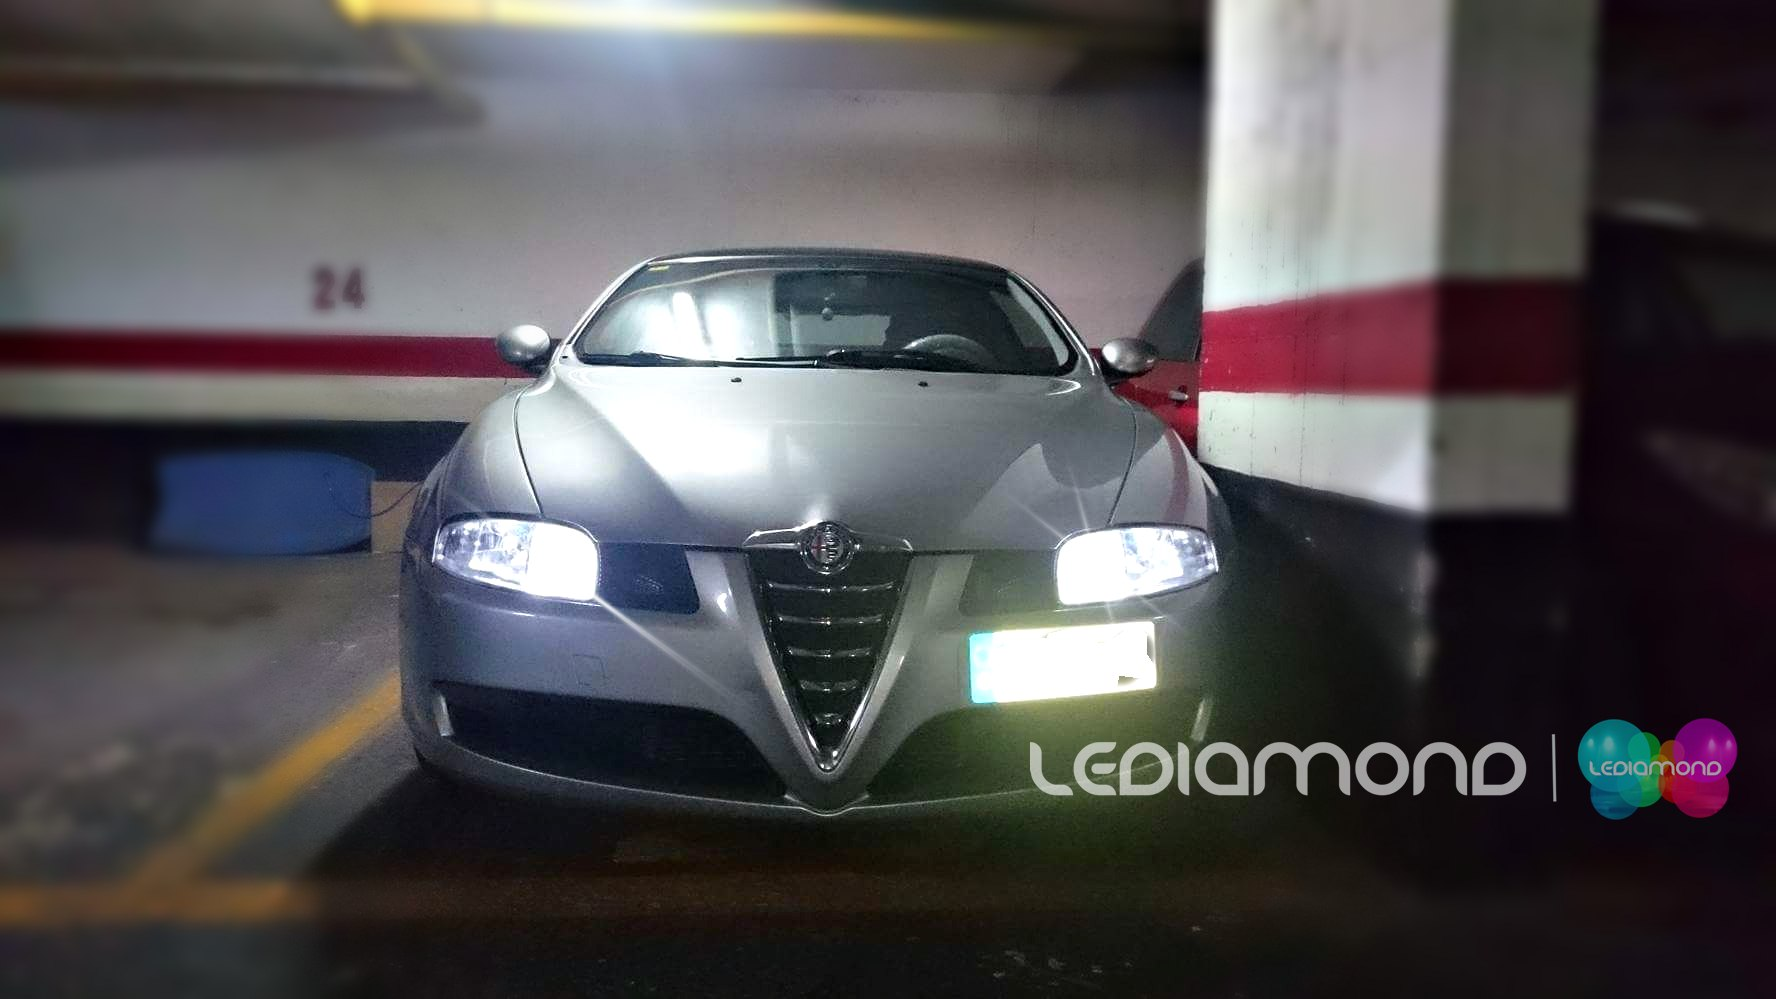 LEDIAMOND_luz_posición_ALFA_ROMEO_GT_H6W-BAX9S